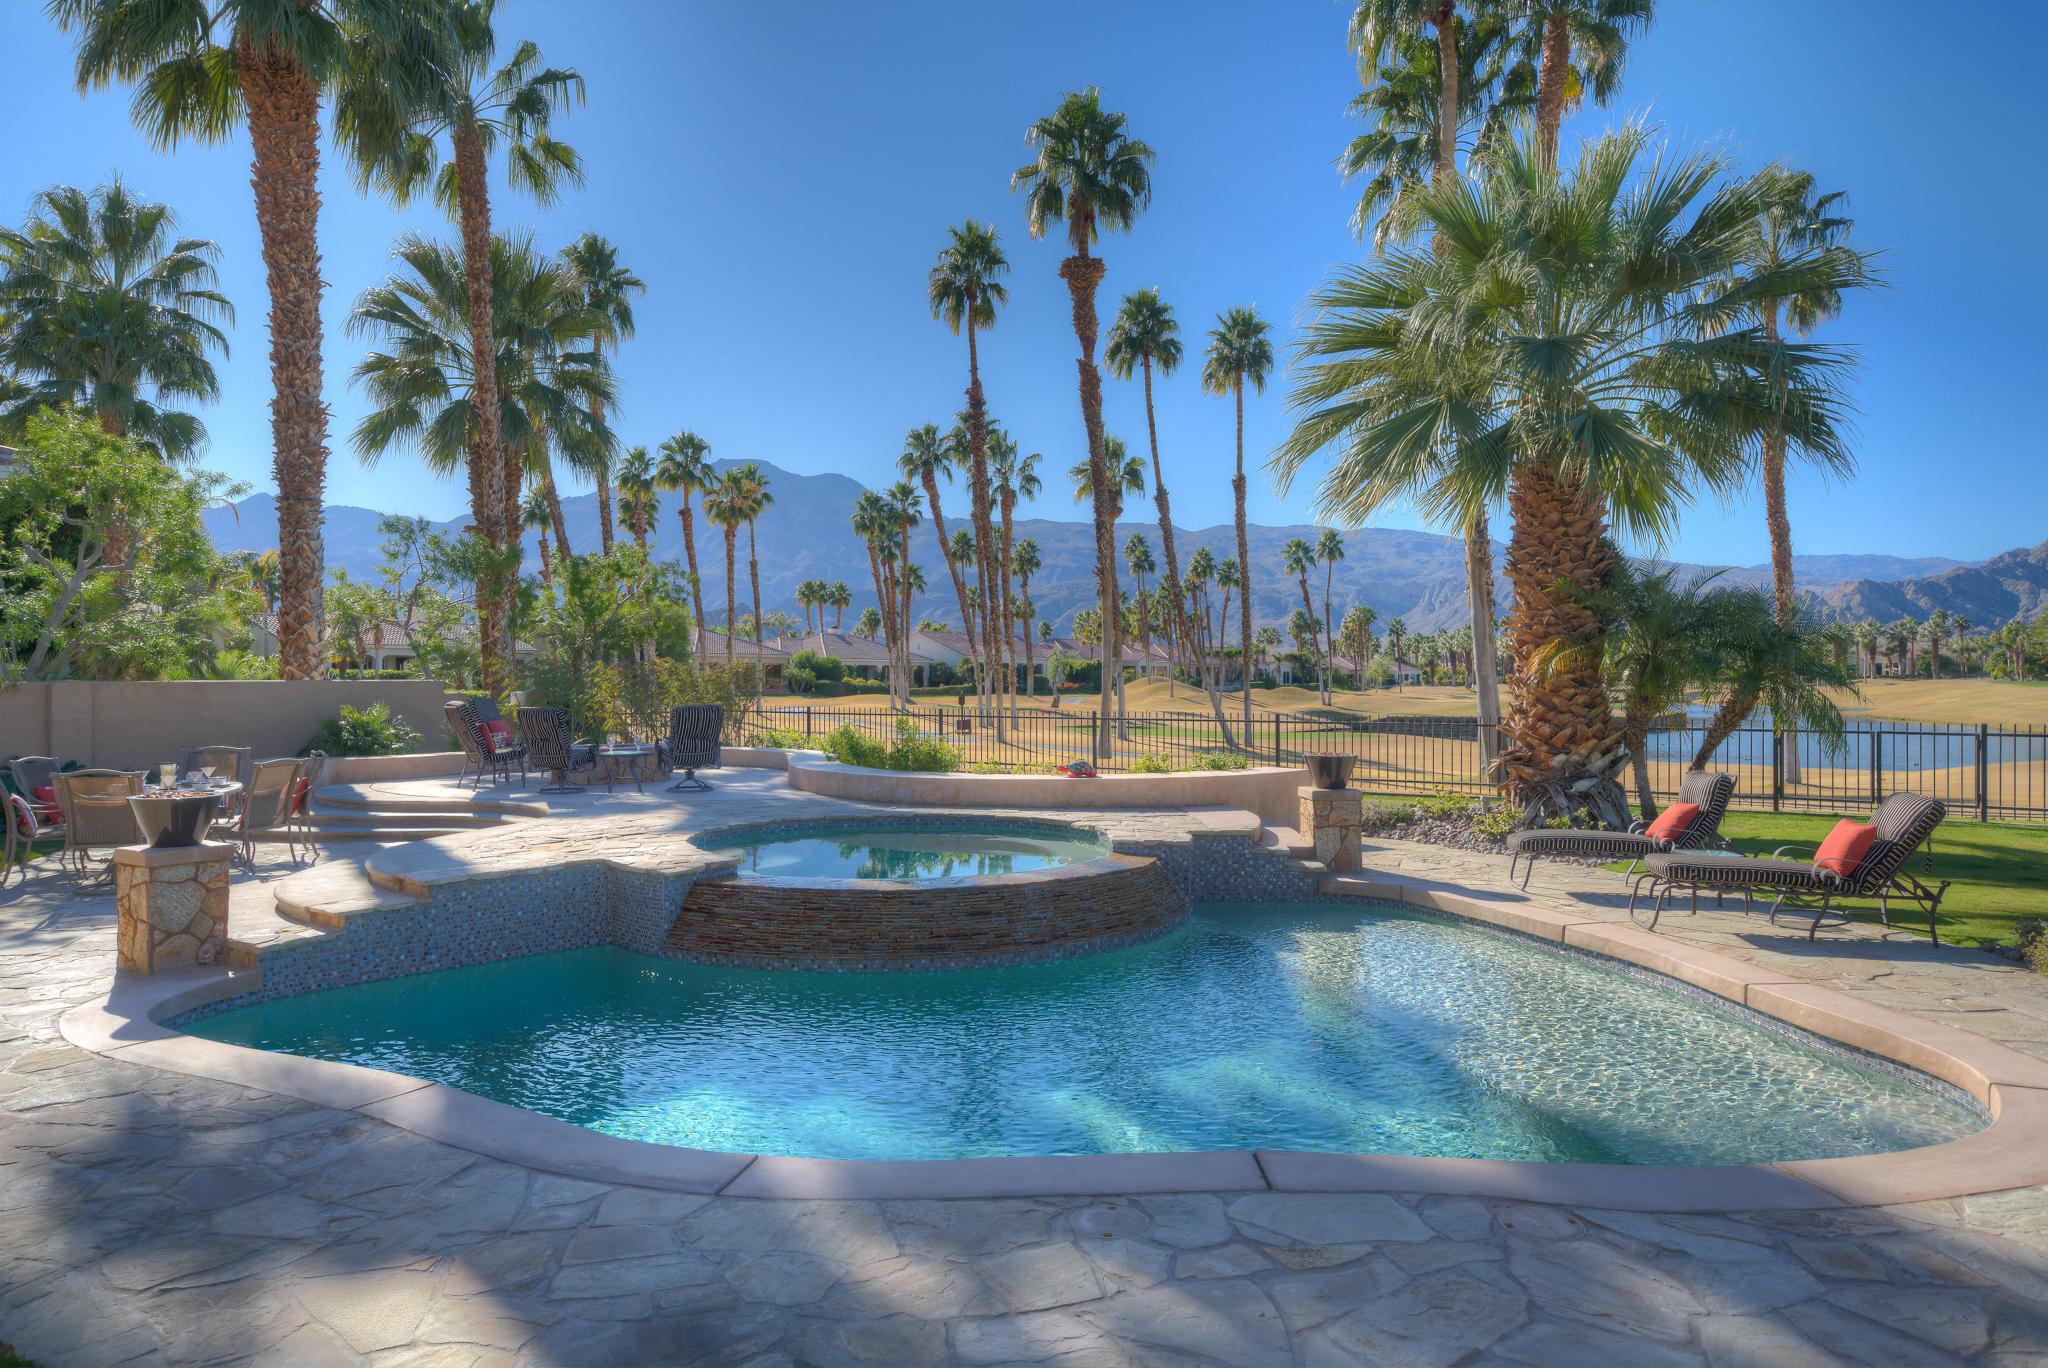 81200 Legends Way, La Quinta, California 92253, 3 Bedrooms Bedrooms, ,4 BathroomsBathrooms,Residential,For Sale,81200 Legends Way,219036774